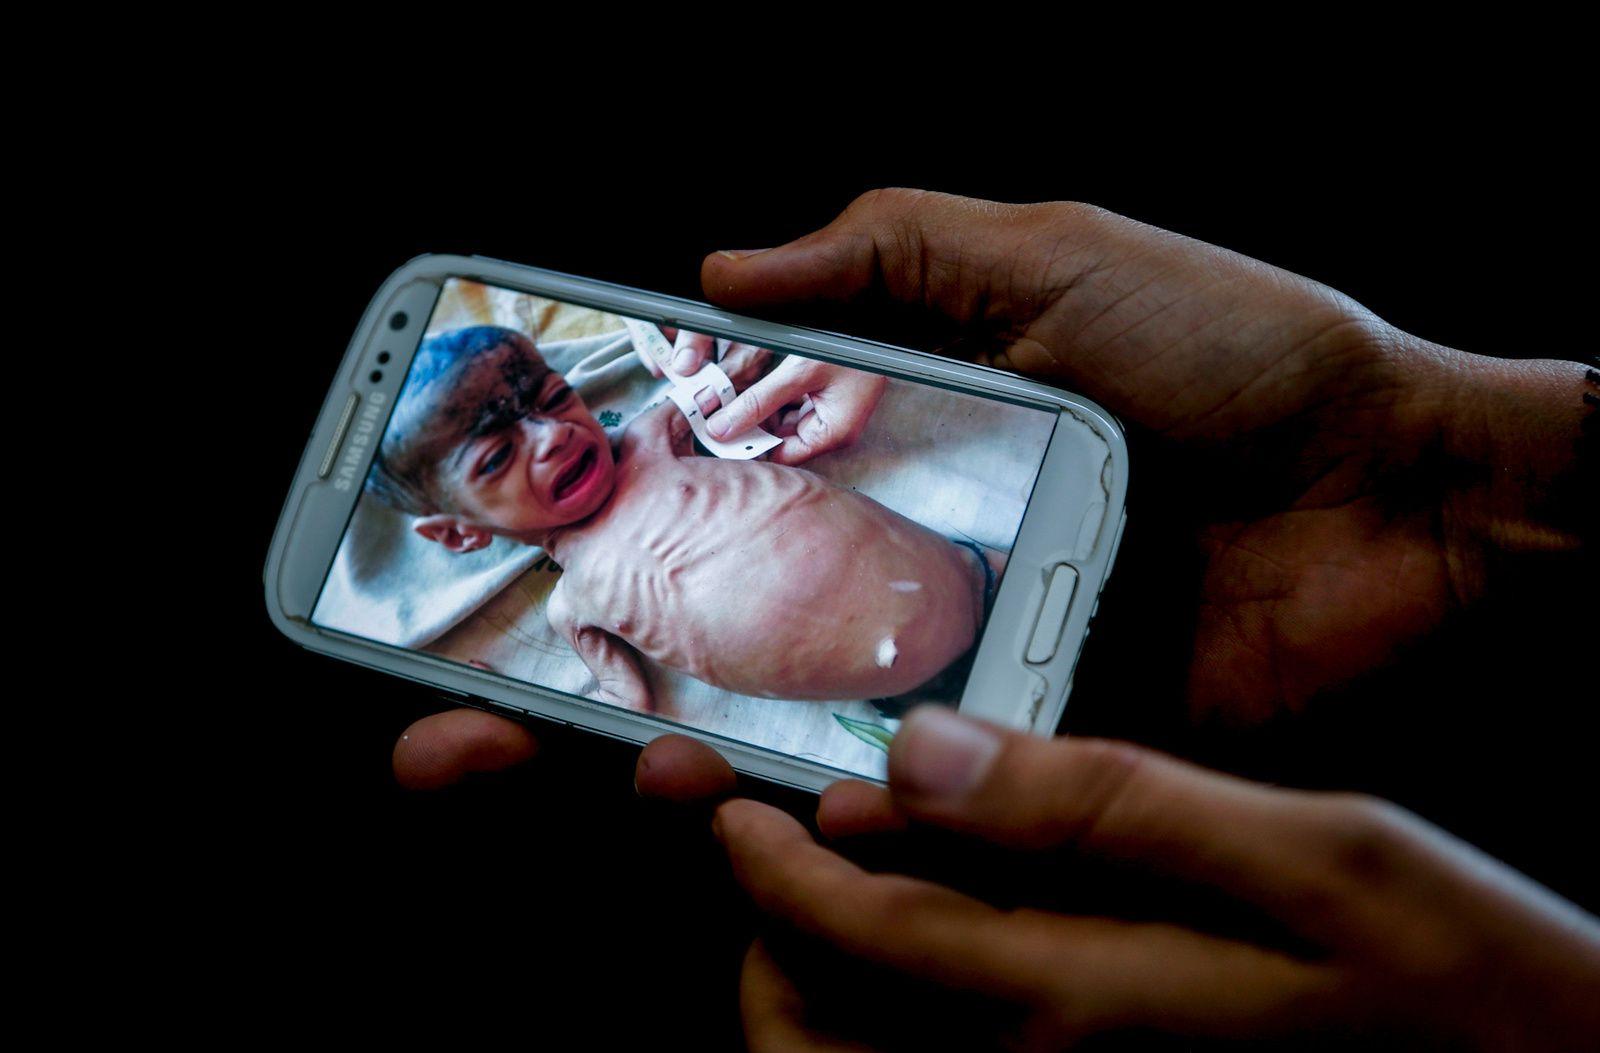 Yemen famine (c) Nariman El-Mofty / AP